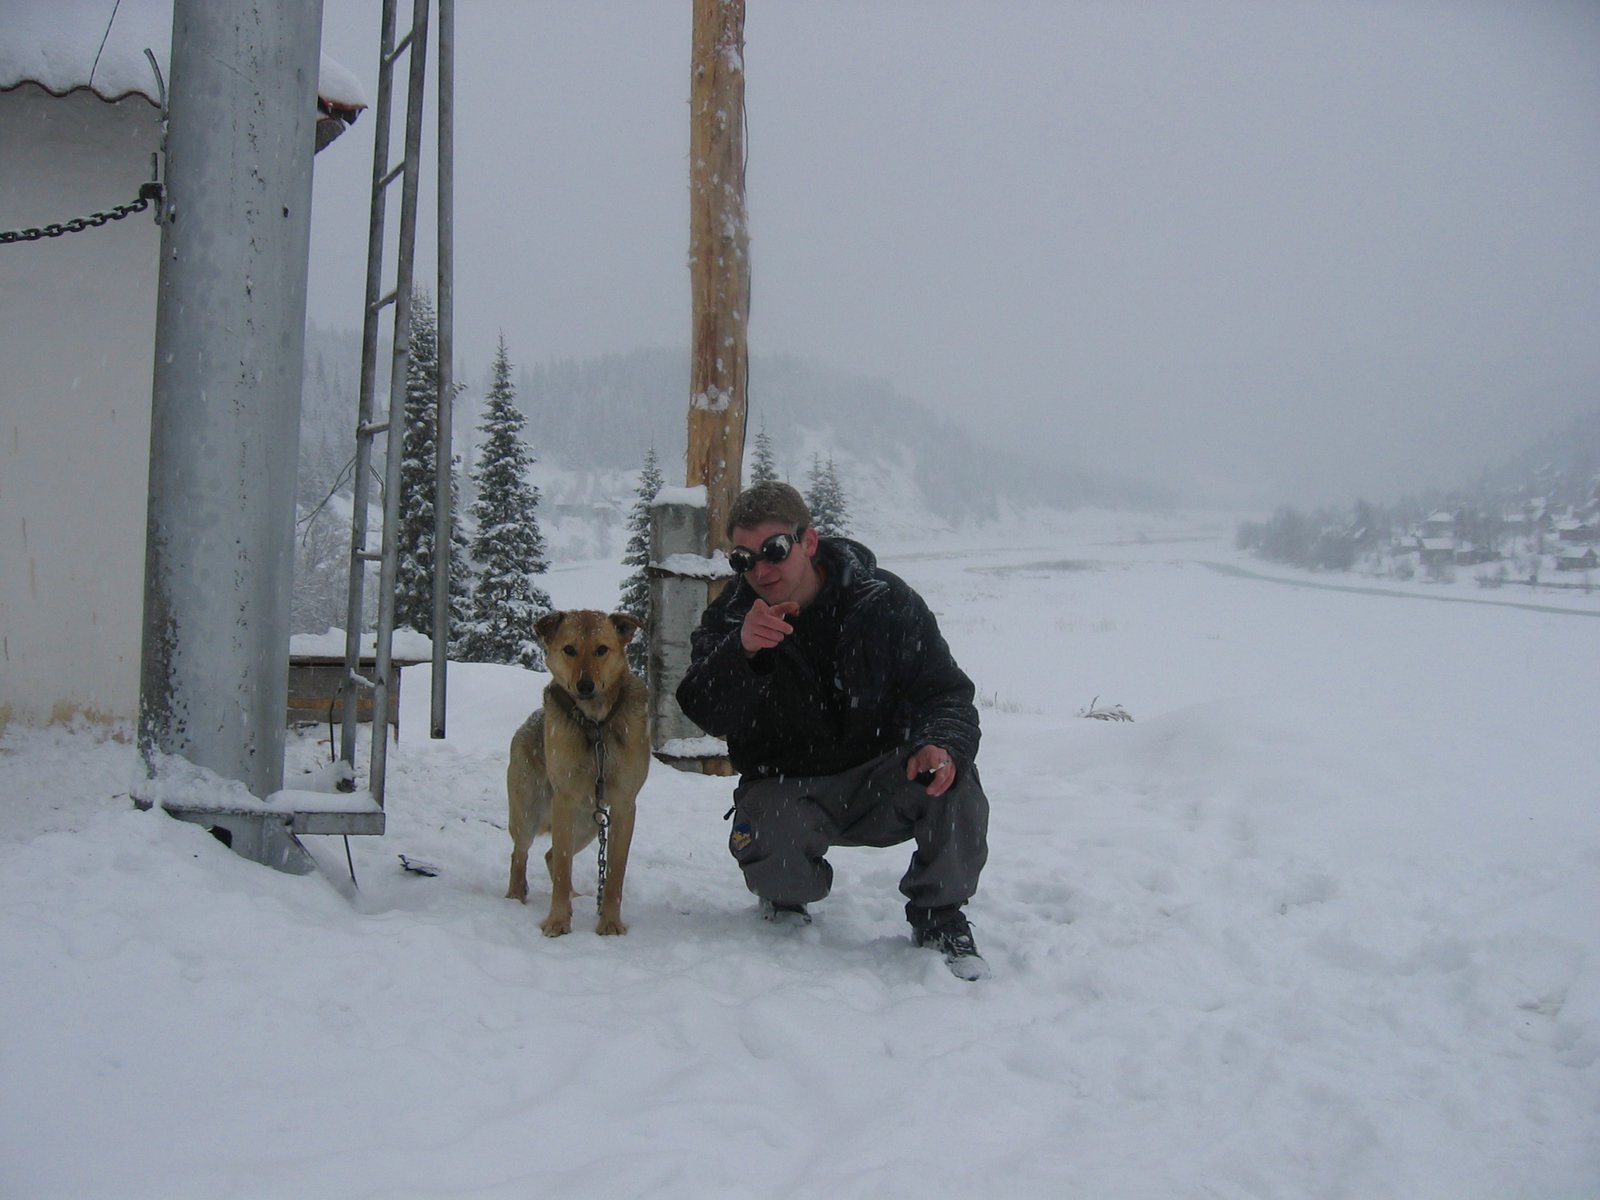 Me and mad dog